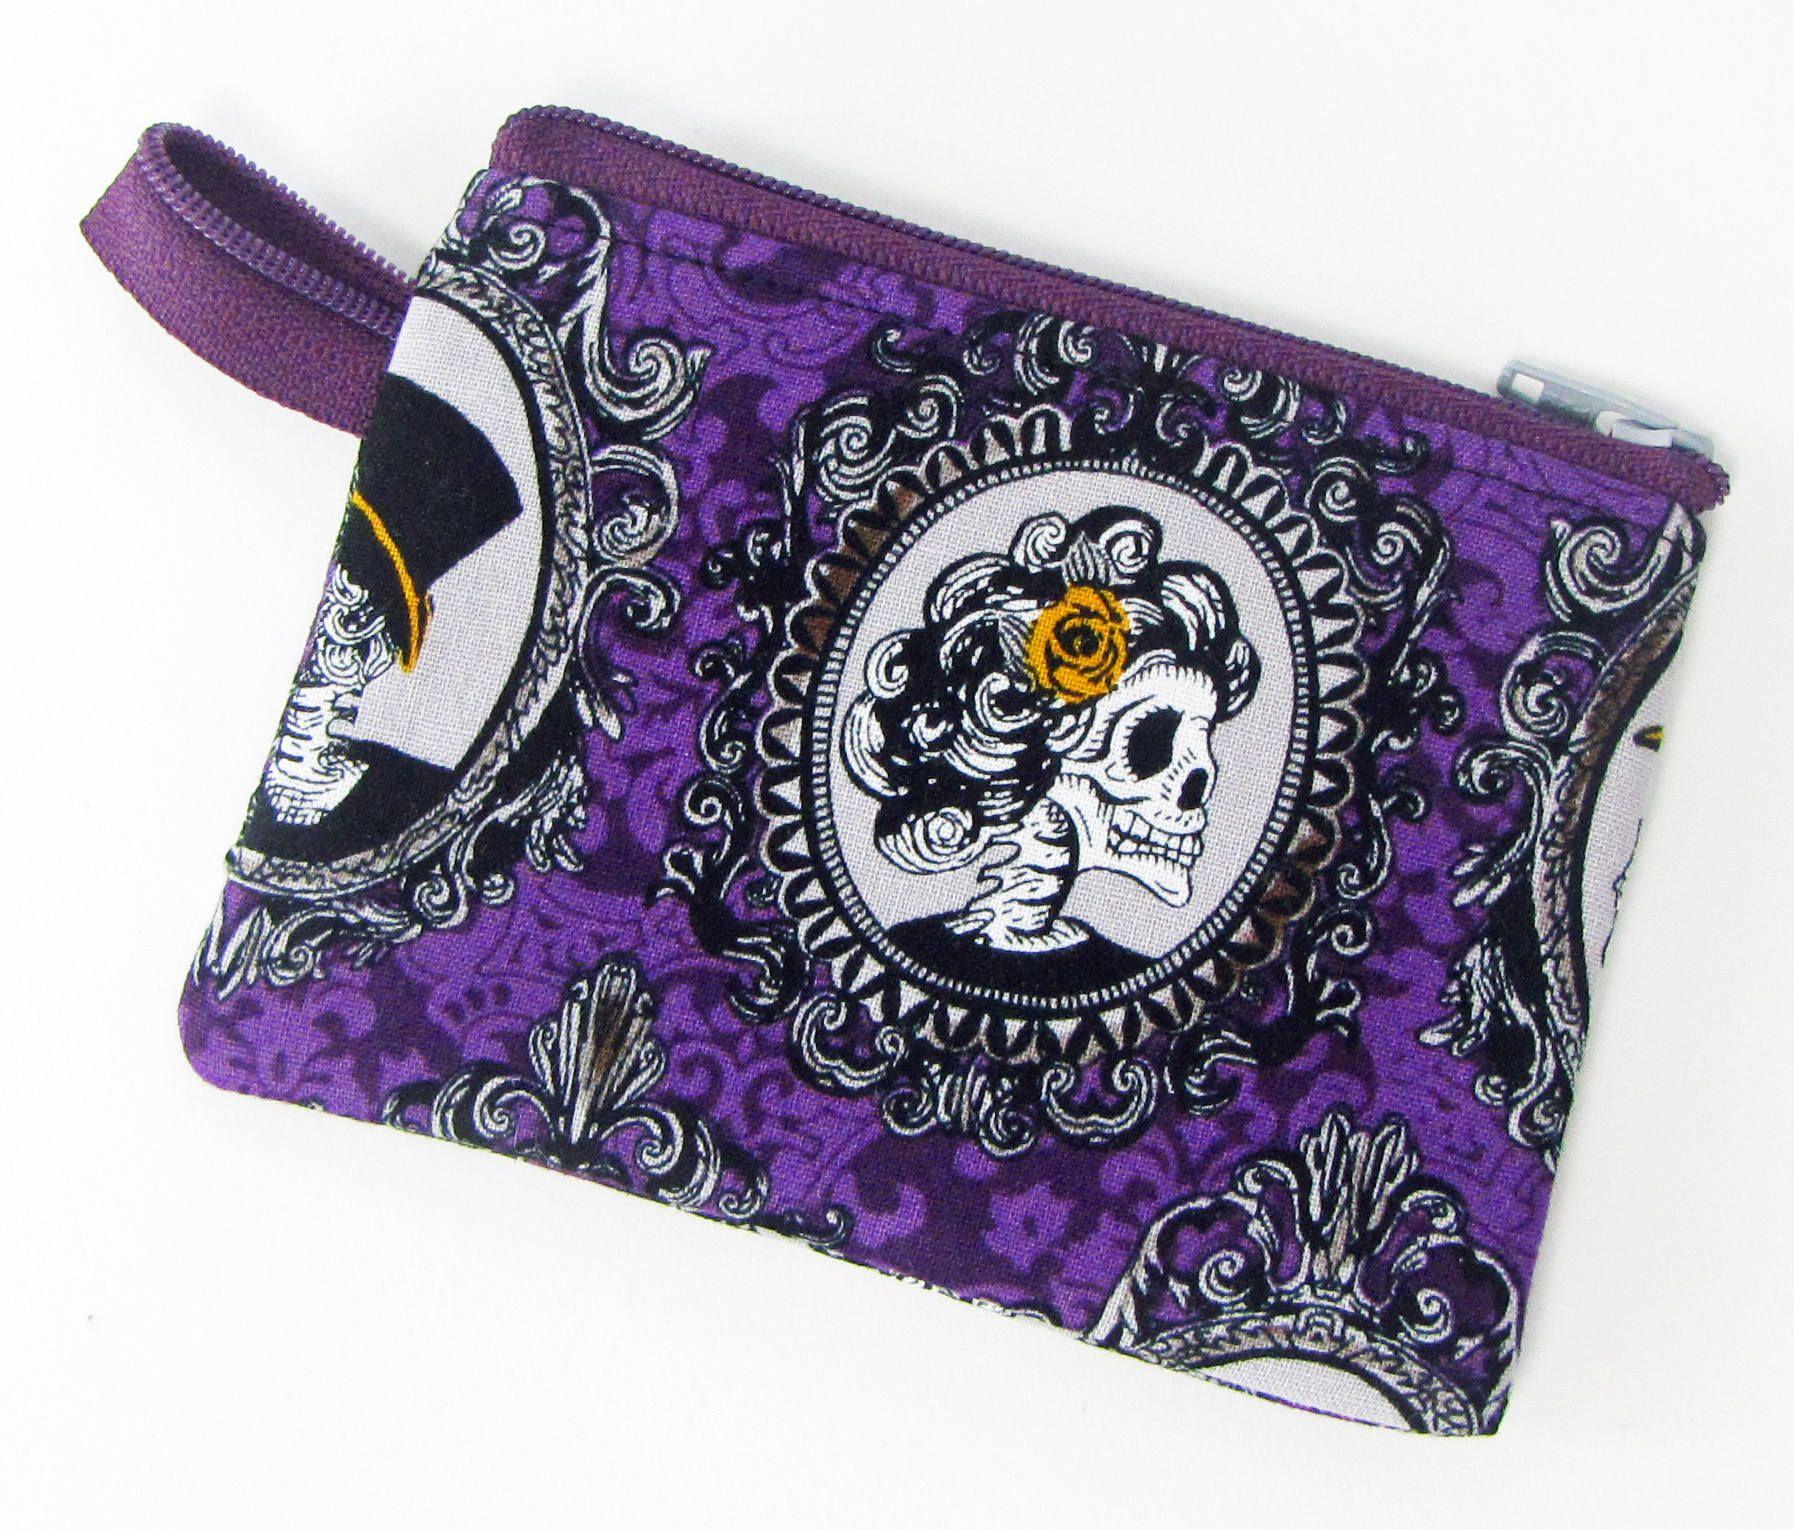 Skulls, credit card case, business card holder, cute coin purse ...